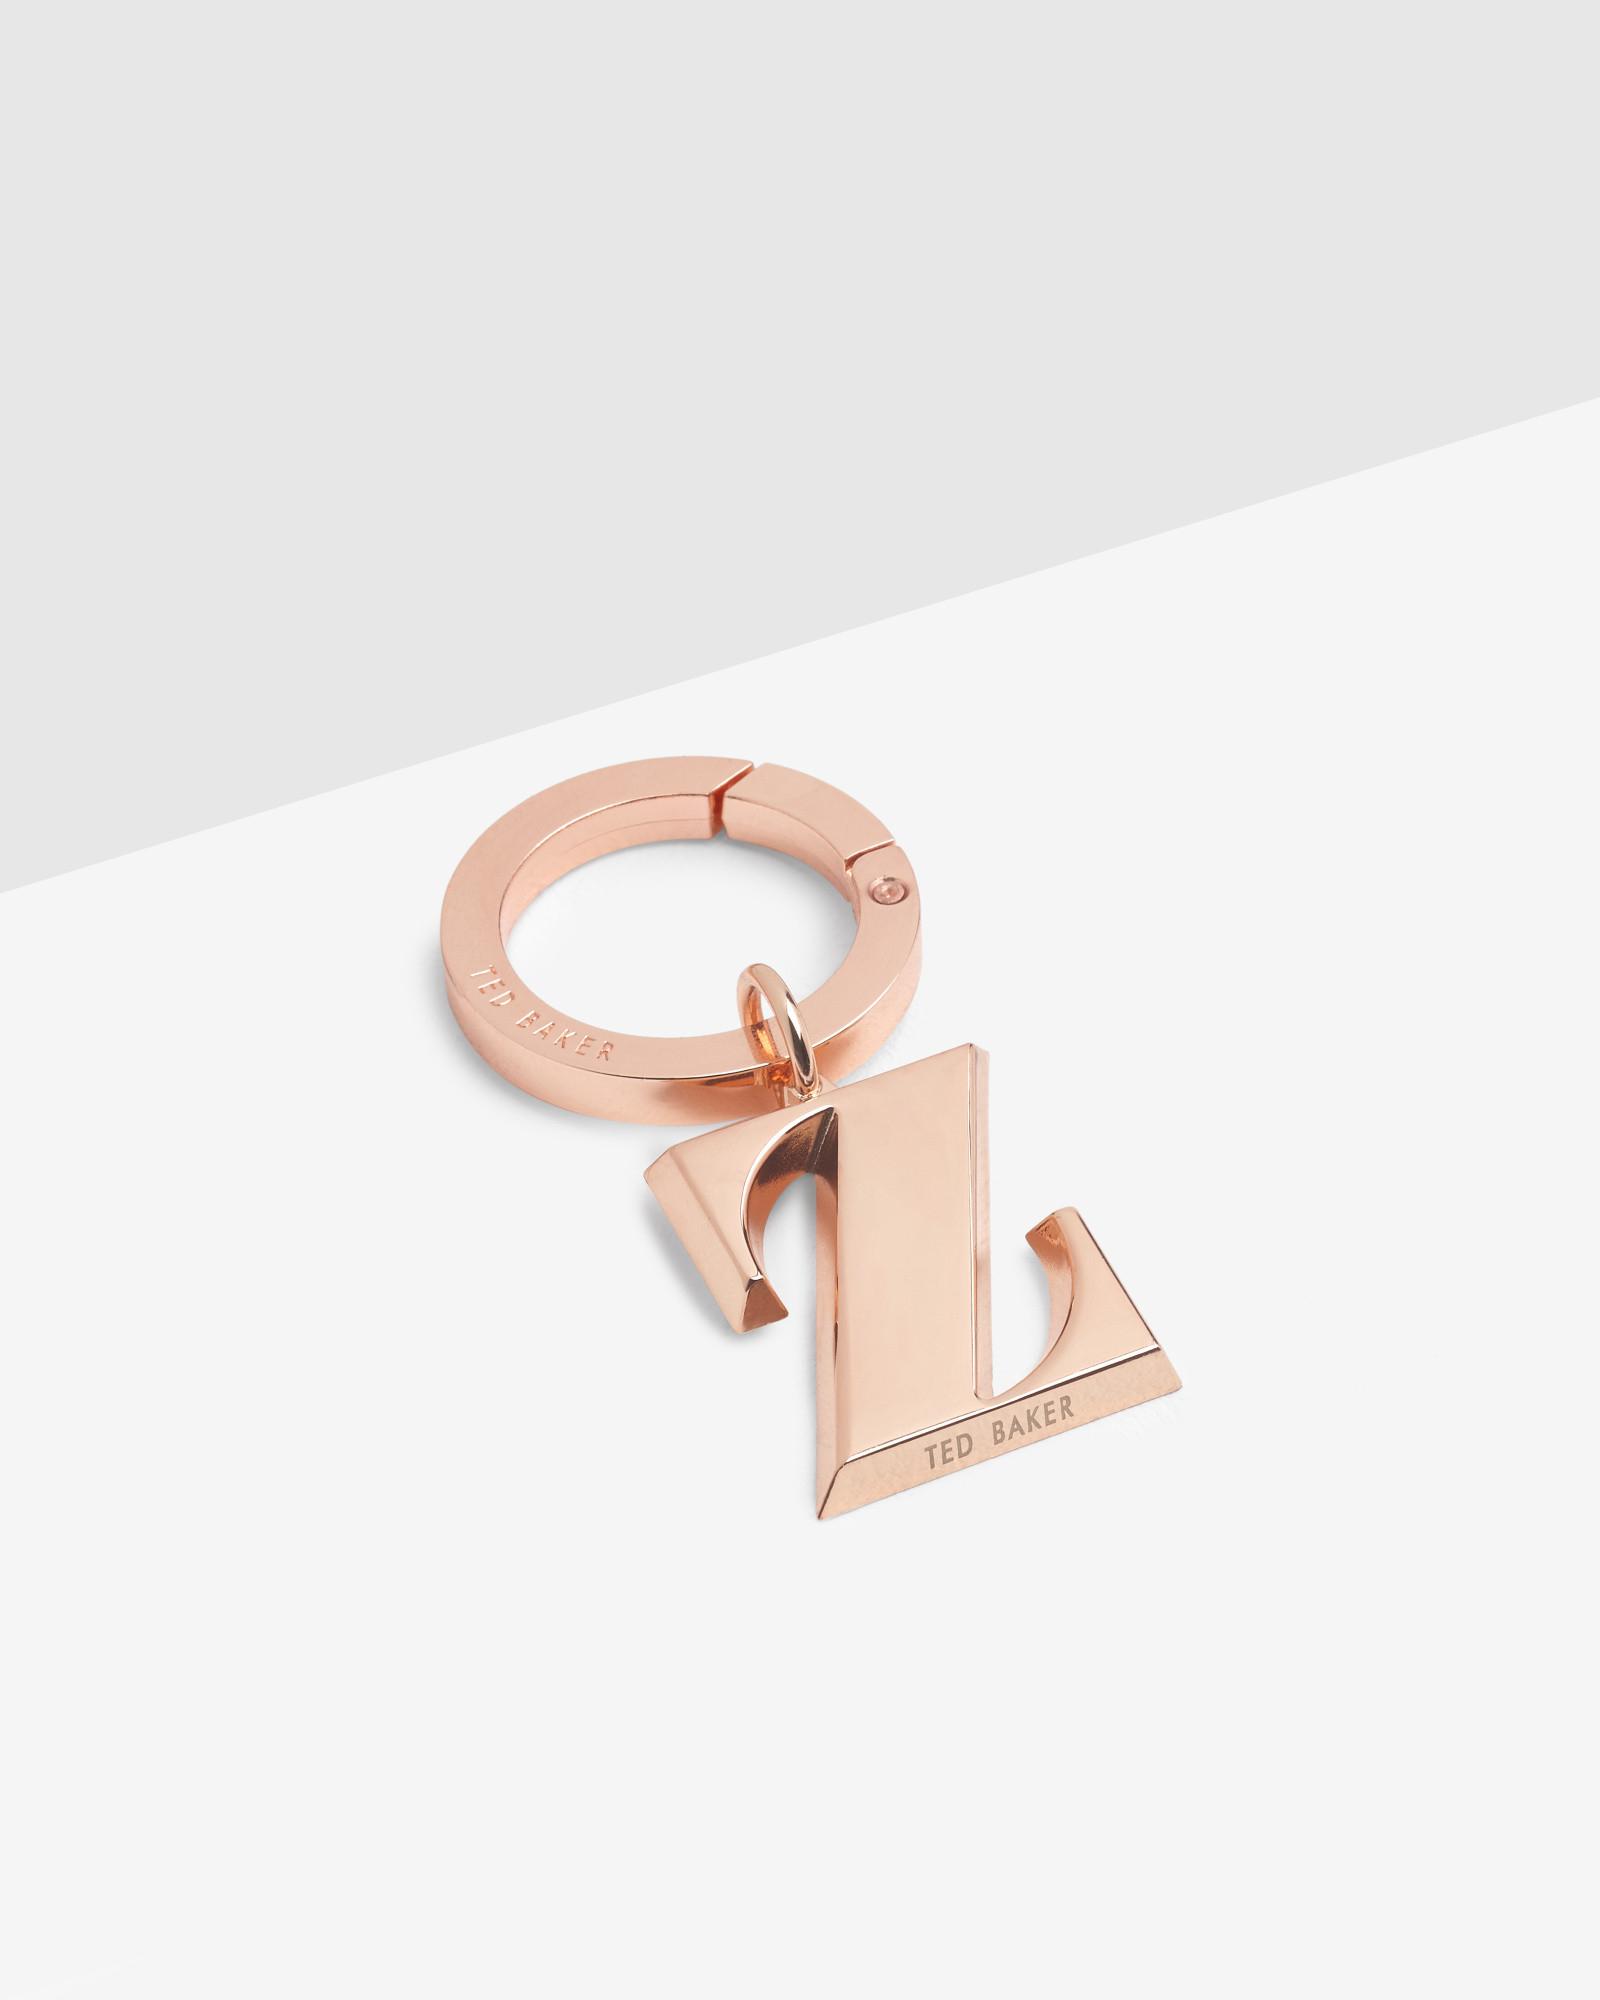 Ted baker letter z keyring charm in pink lyst for Rose gold letter charms